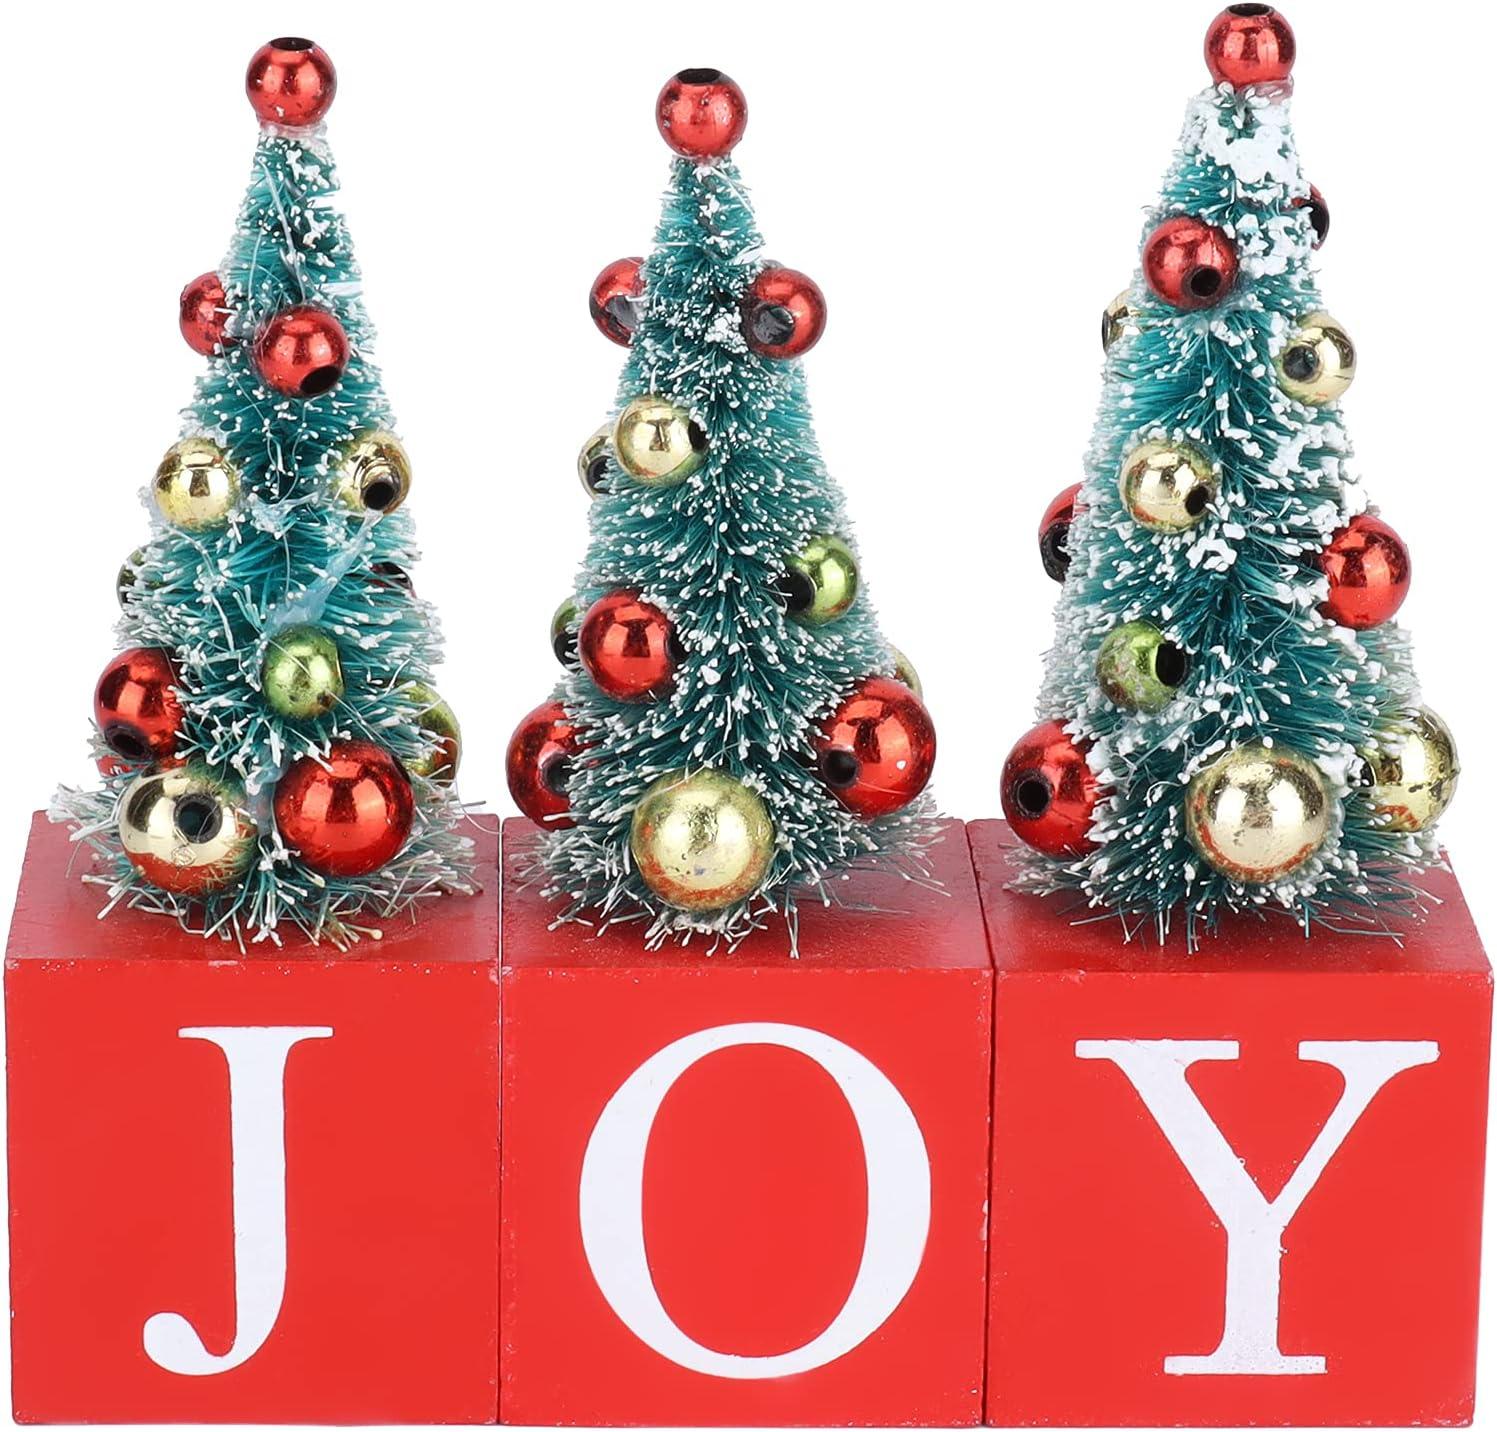 EVTSCAN Christmas Tree Ornament Cute Mini Popular Excellent brand in the world Desktop